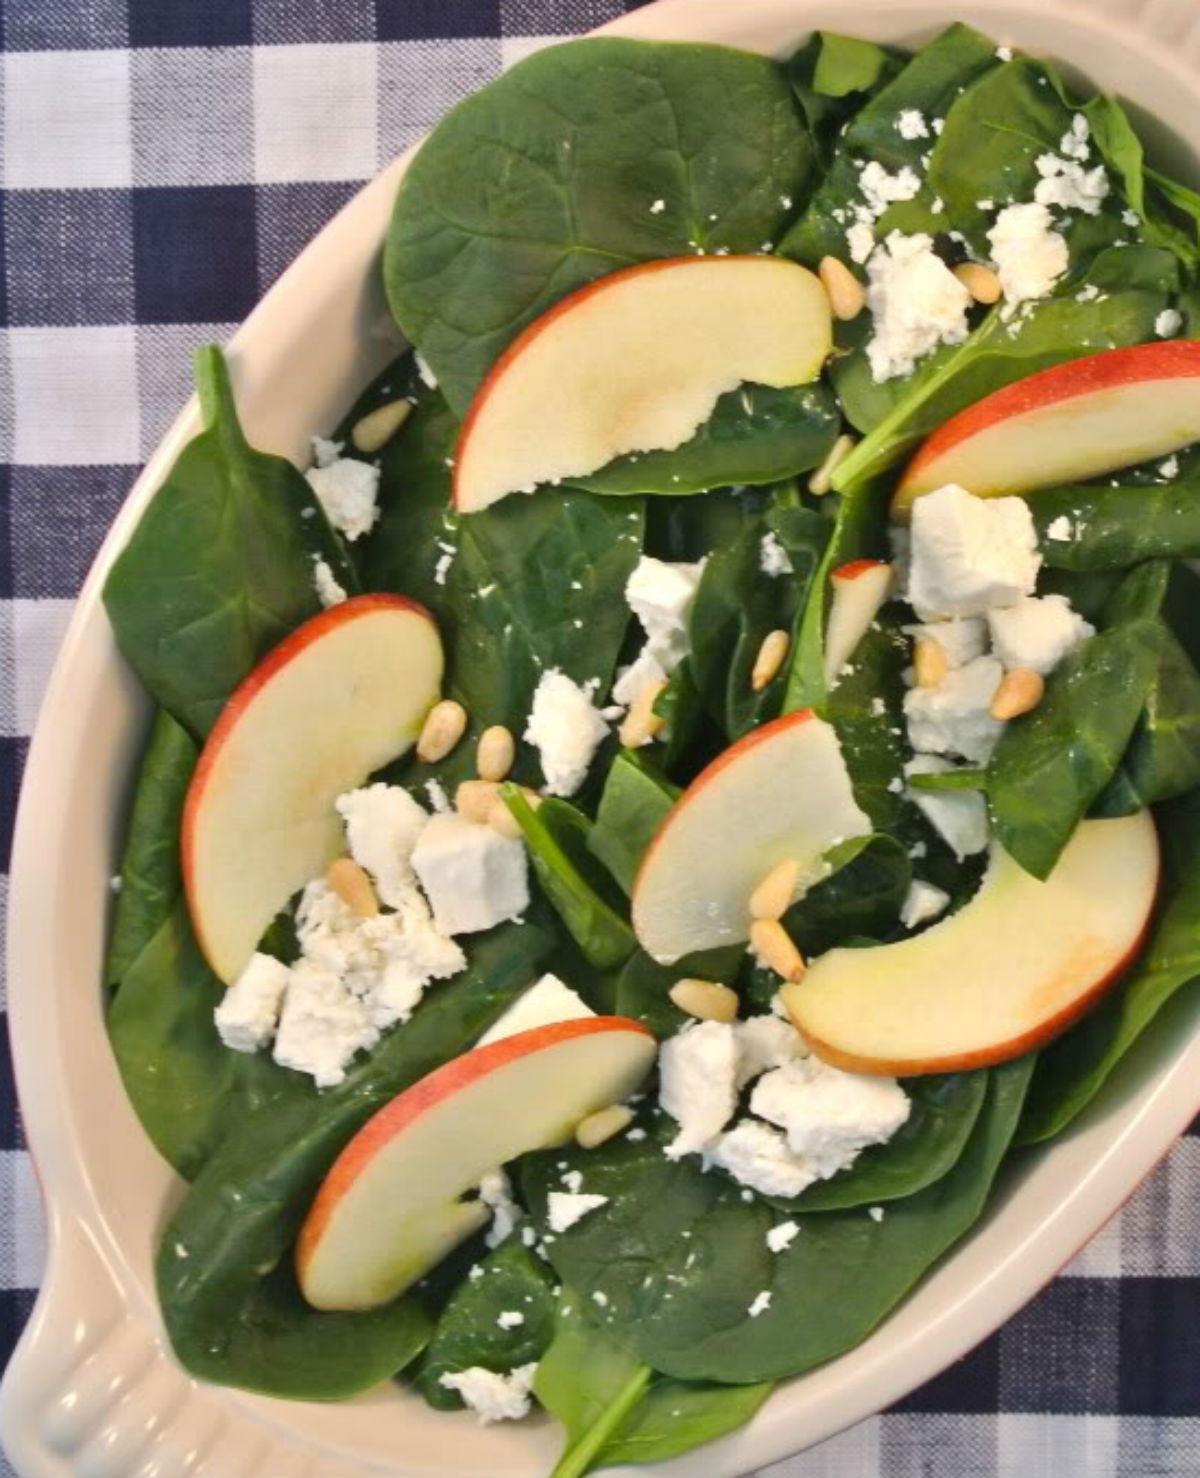 Salade met spinazie, appel en feta